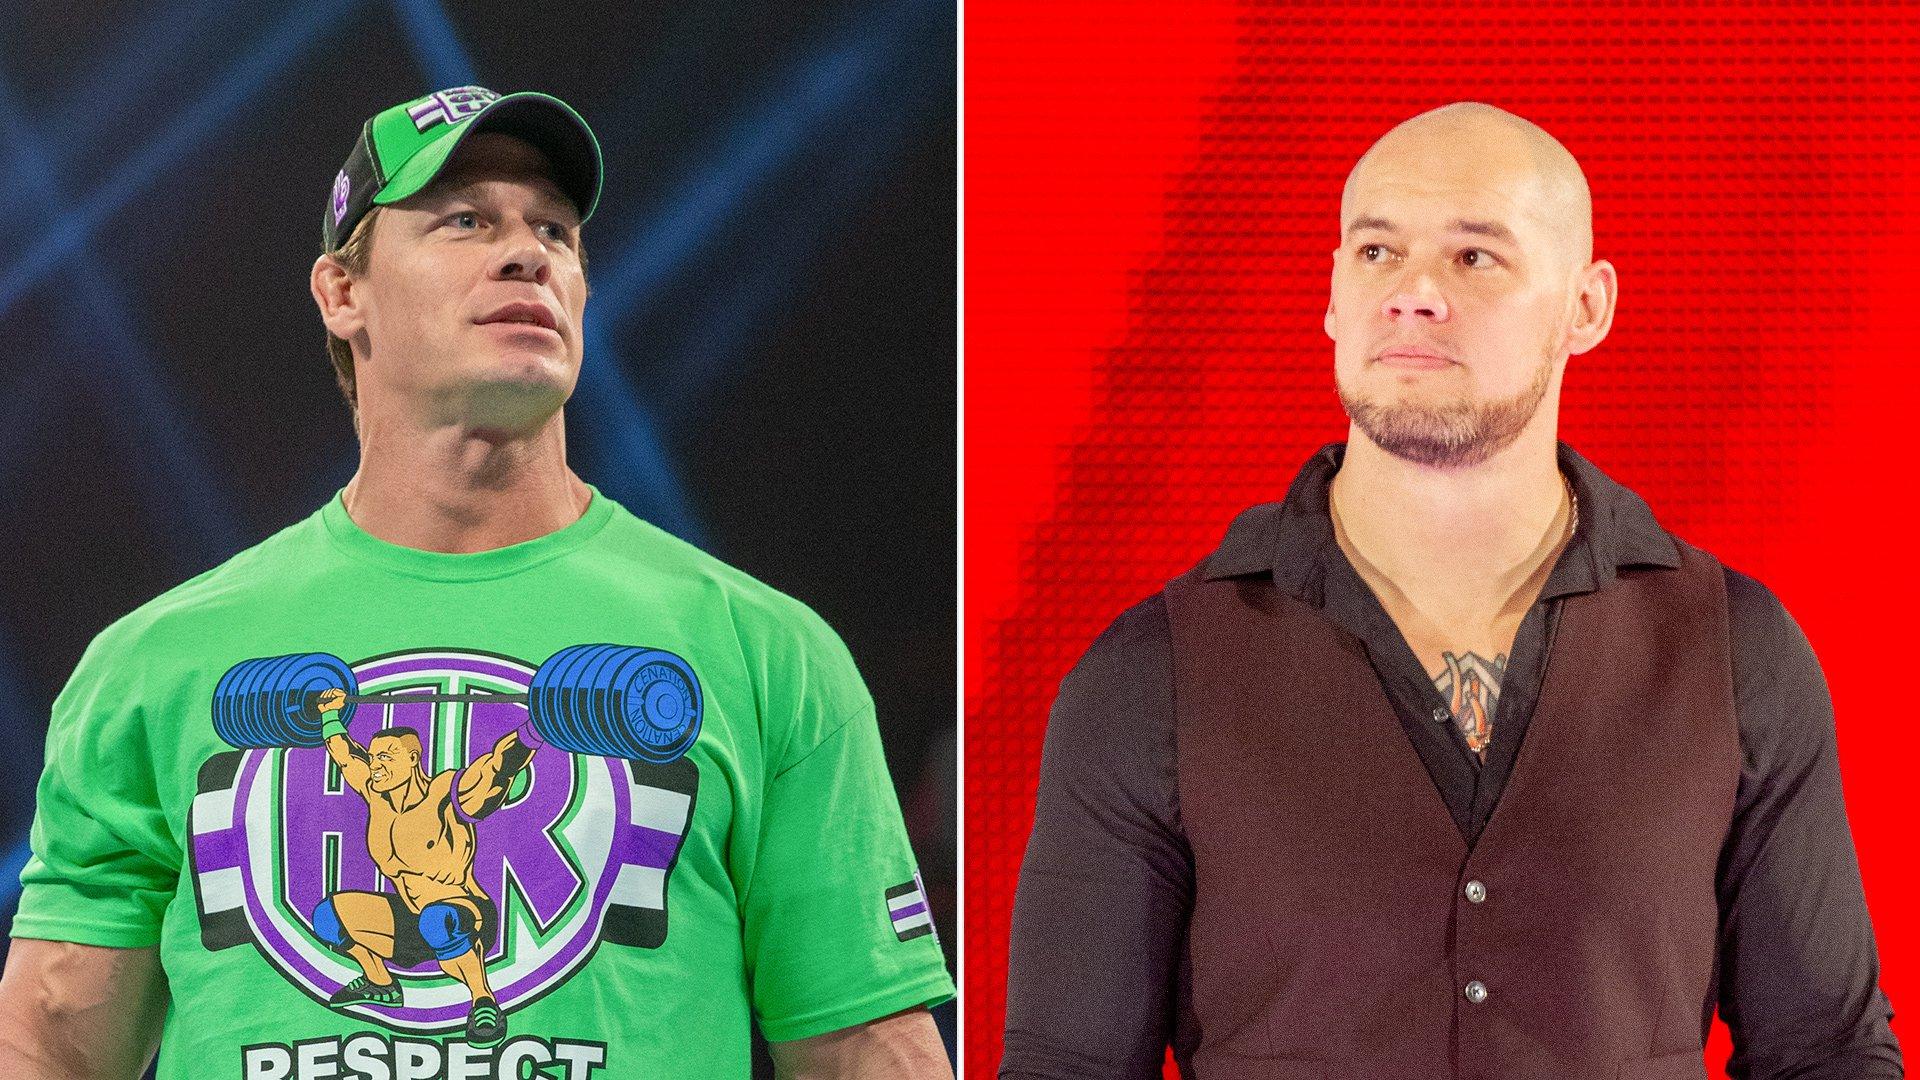 1399f353f John Cena calls Baron Corbin a dumpster fire after Kurt Angle's  WrestleMania reveal: WWE Now